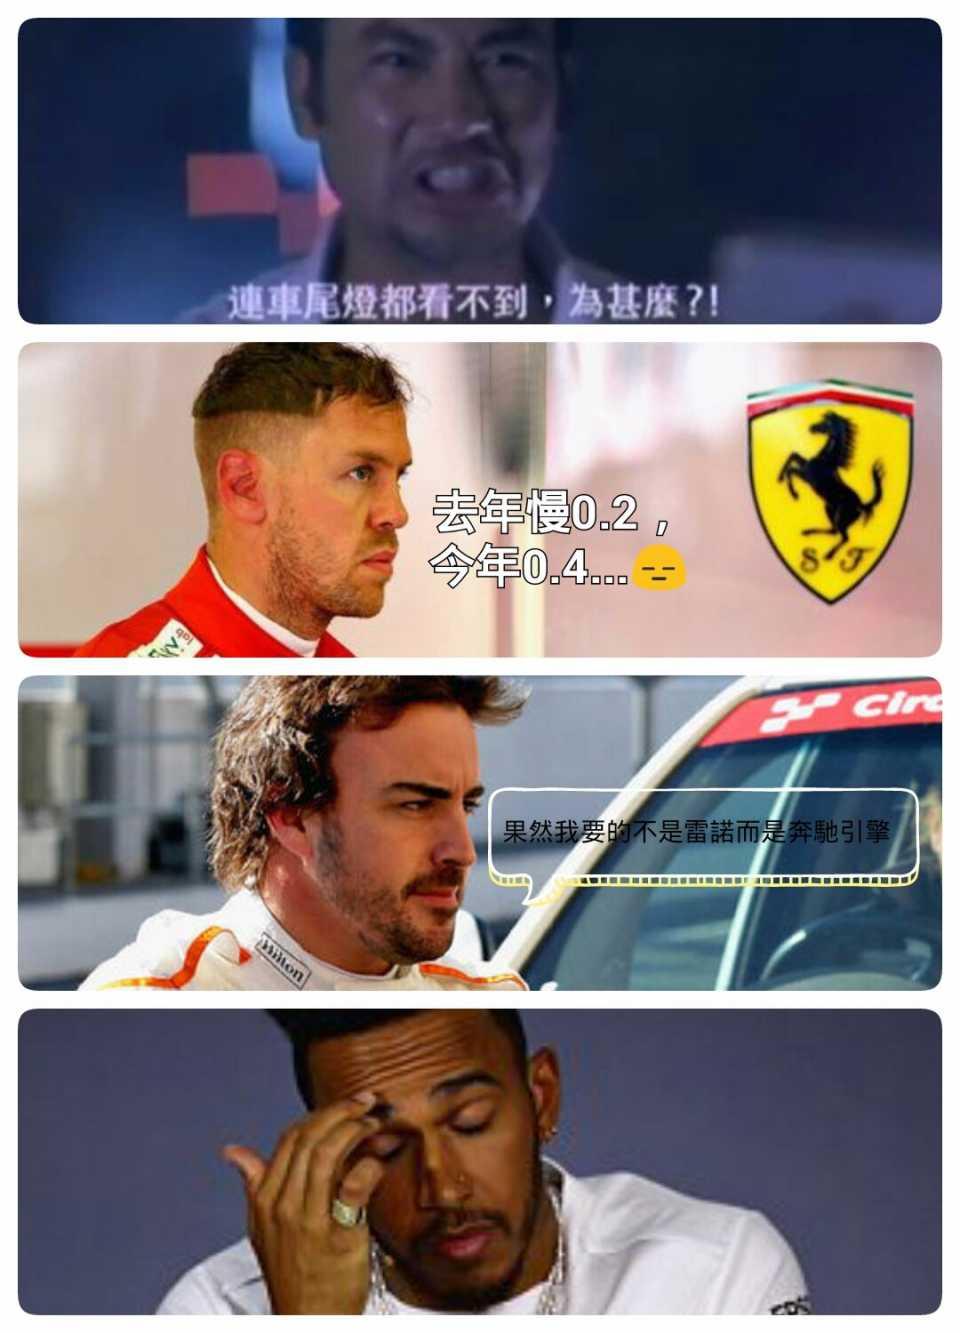 F1-news-Fernando-Alonso-935750_1521882317808.jpg